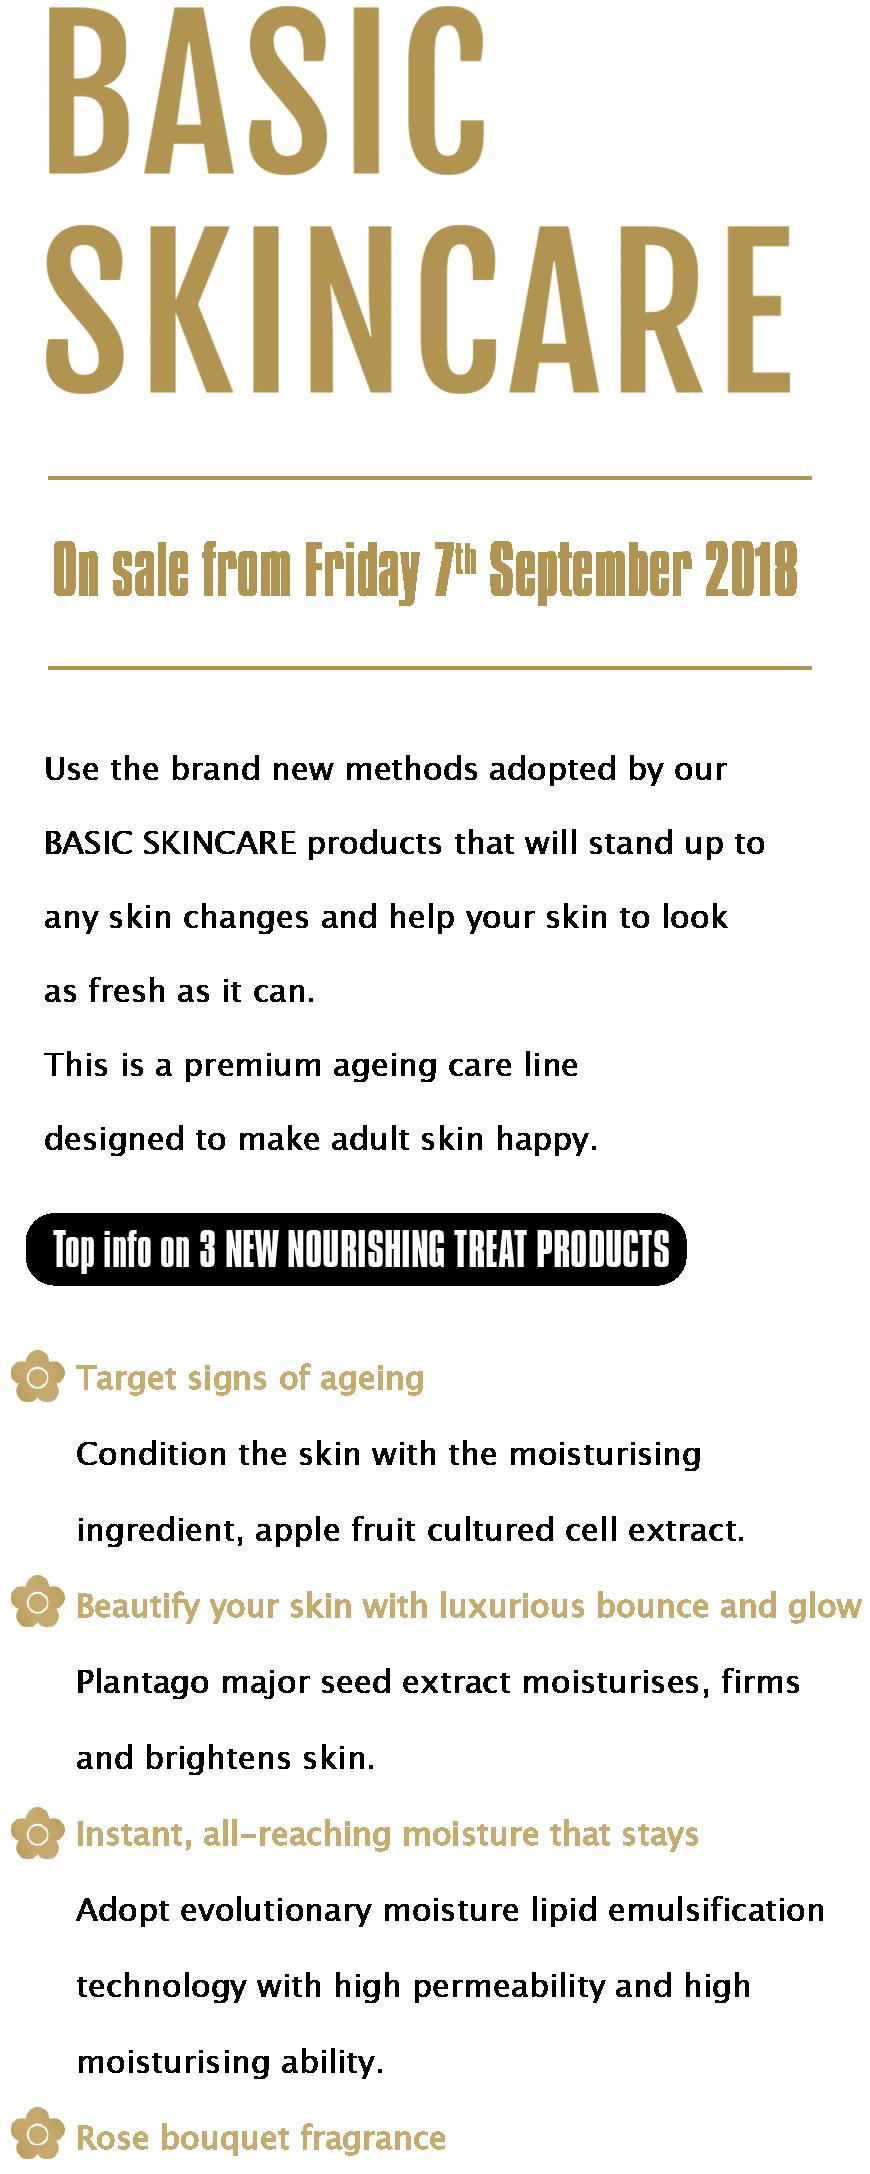 nourishing_title_eng.png